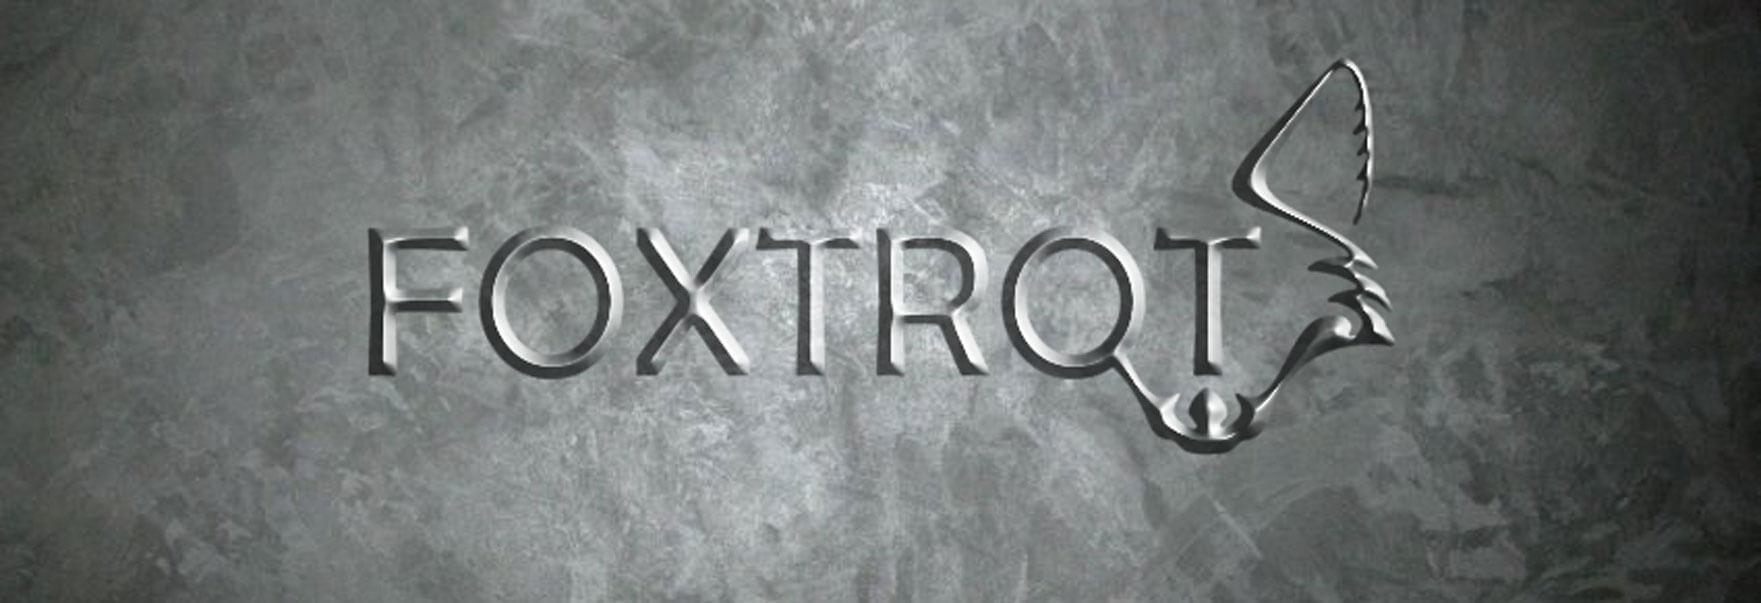 Foxtrot distribution